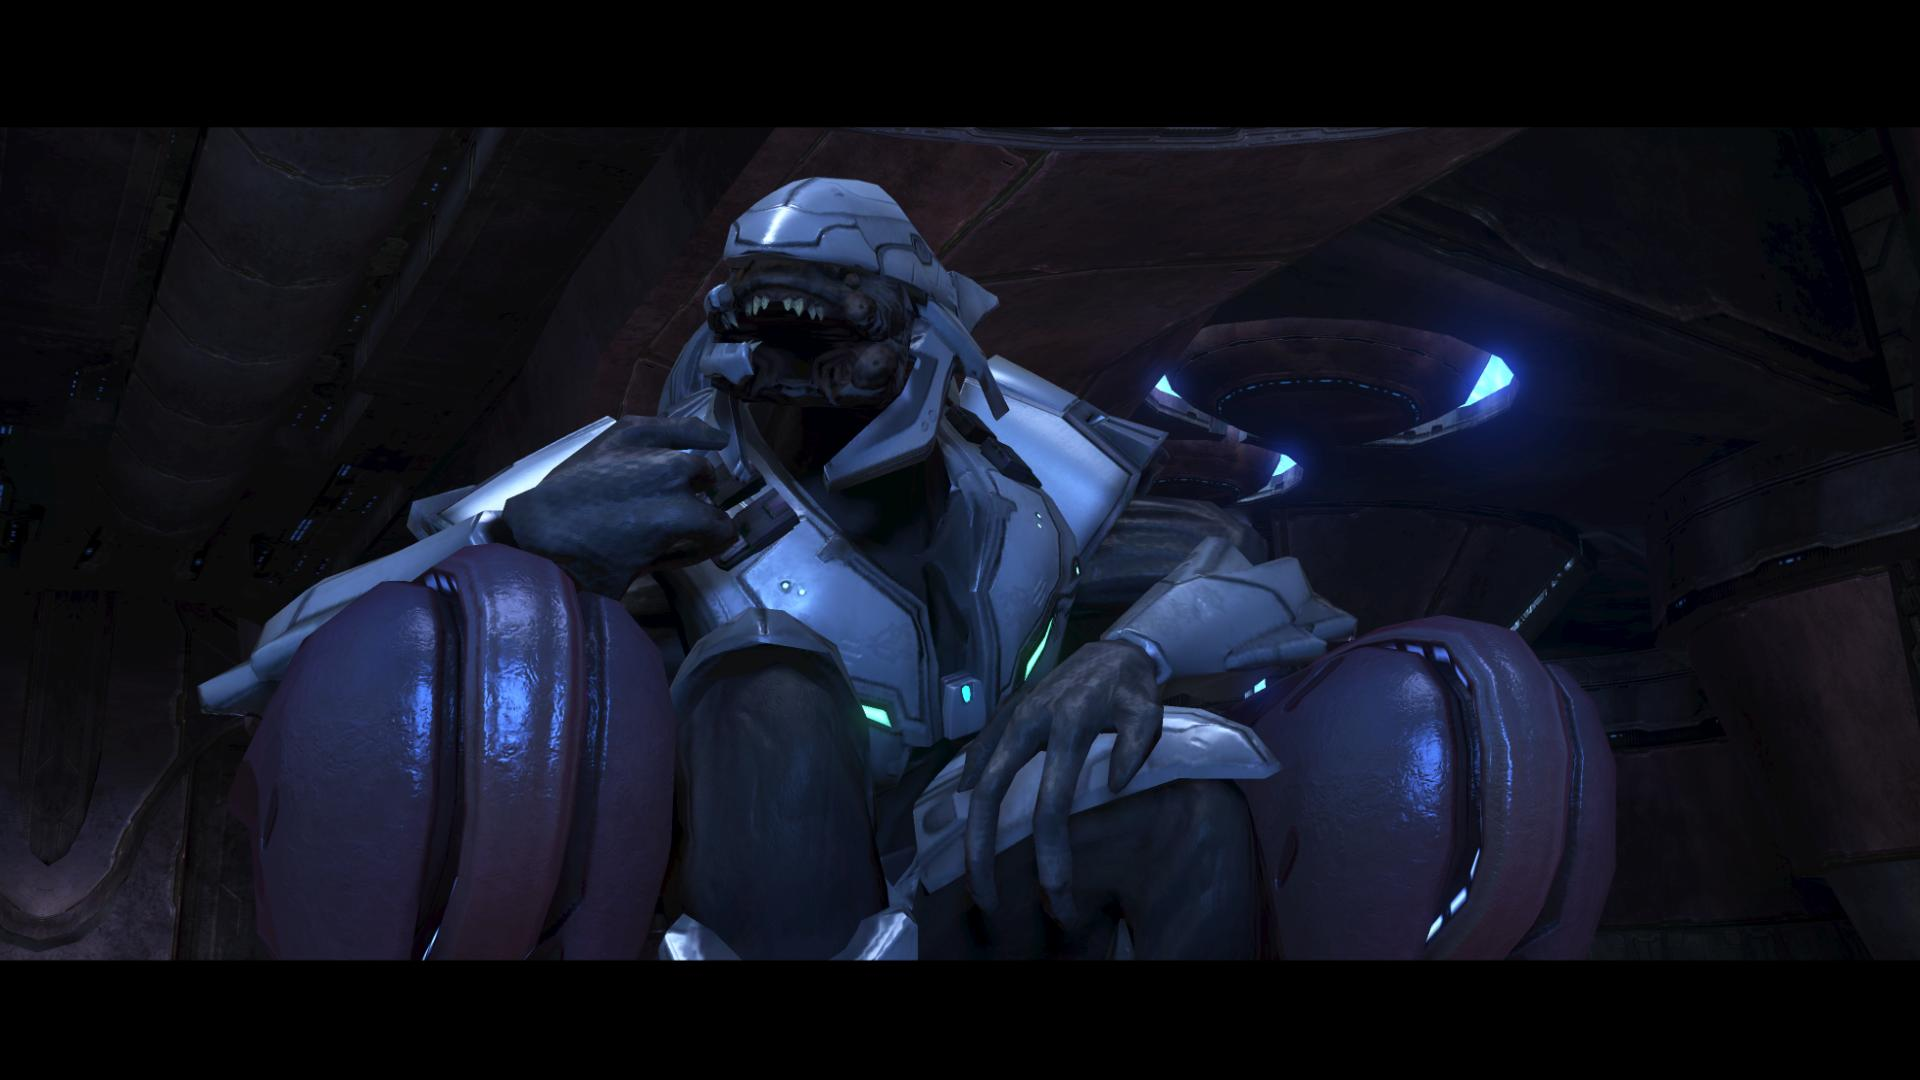 Metal Slug: Operacion Sangheili Attack Halo_3_-_Shipmaster_Rtas_Vadum